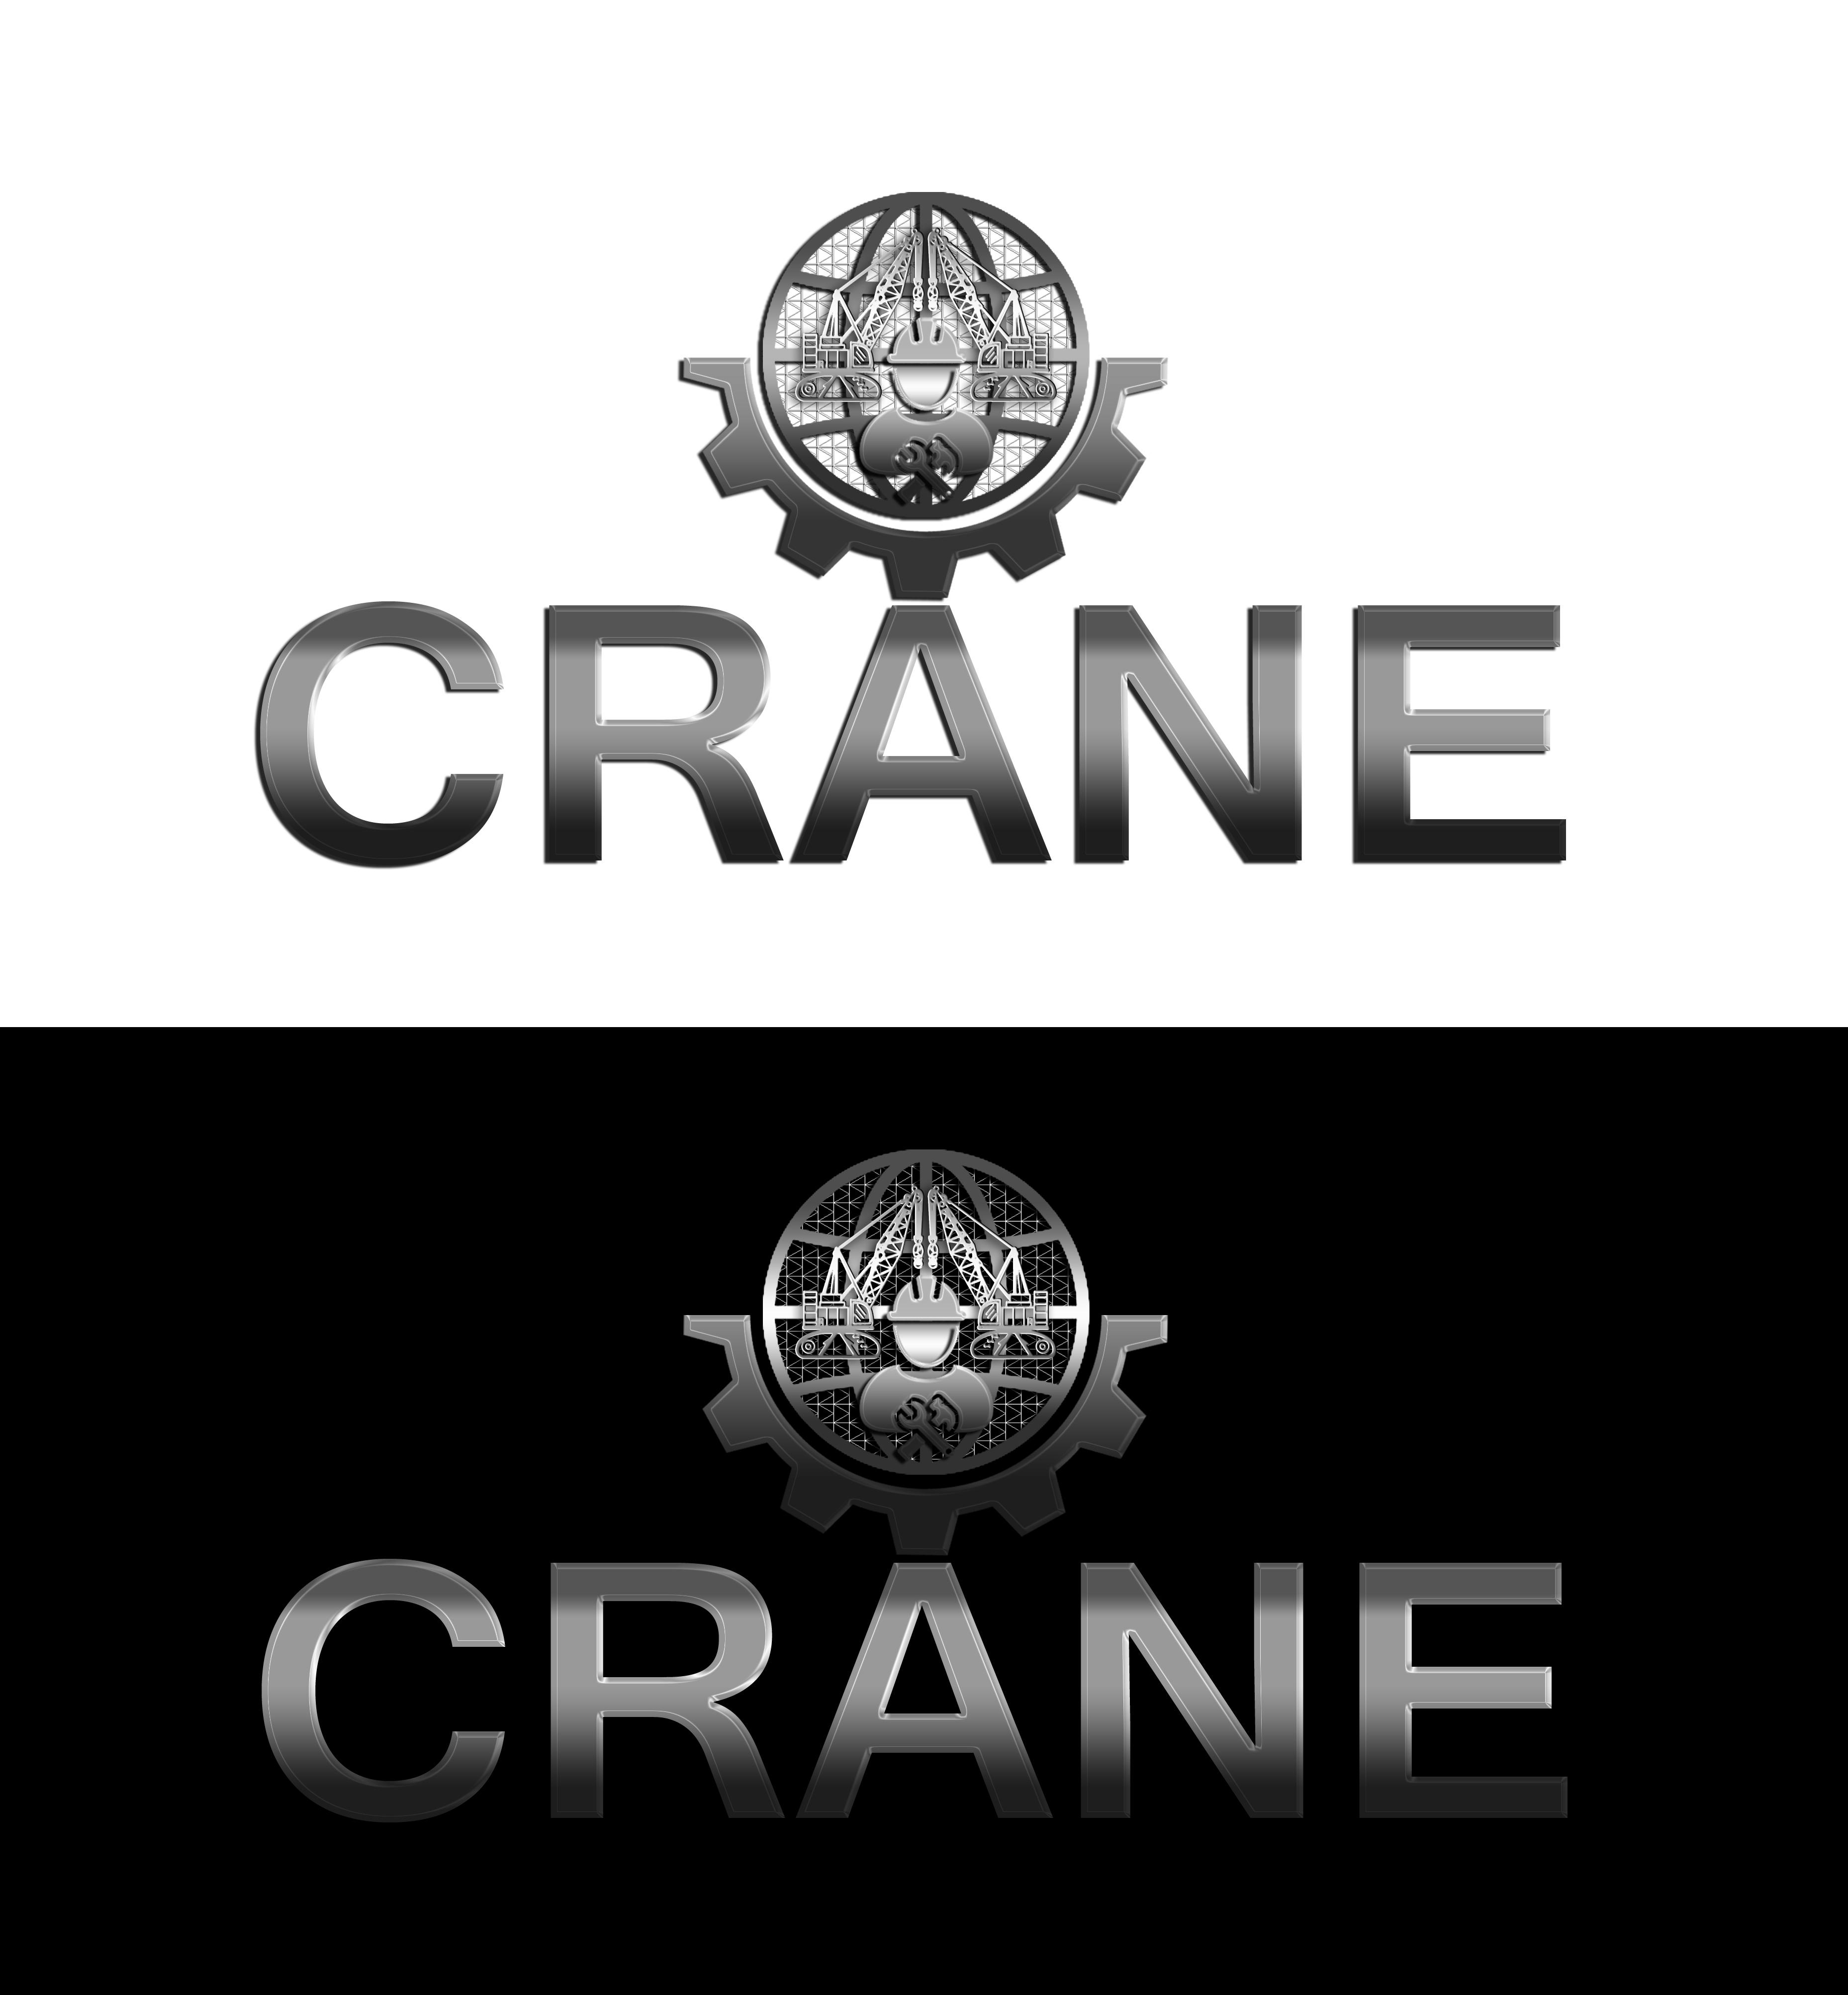 Logo Design by JSDESIGNGROUP - Entry No. 115 in the Logo Design Contest Inspiring Logo Design for Crane Integrated Facility Services.